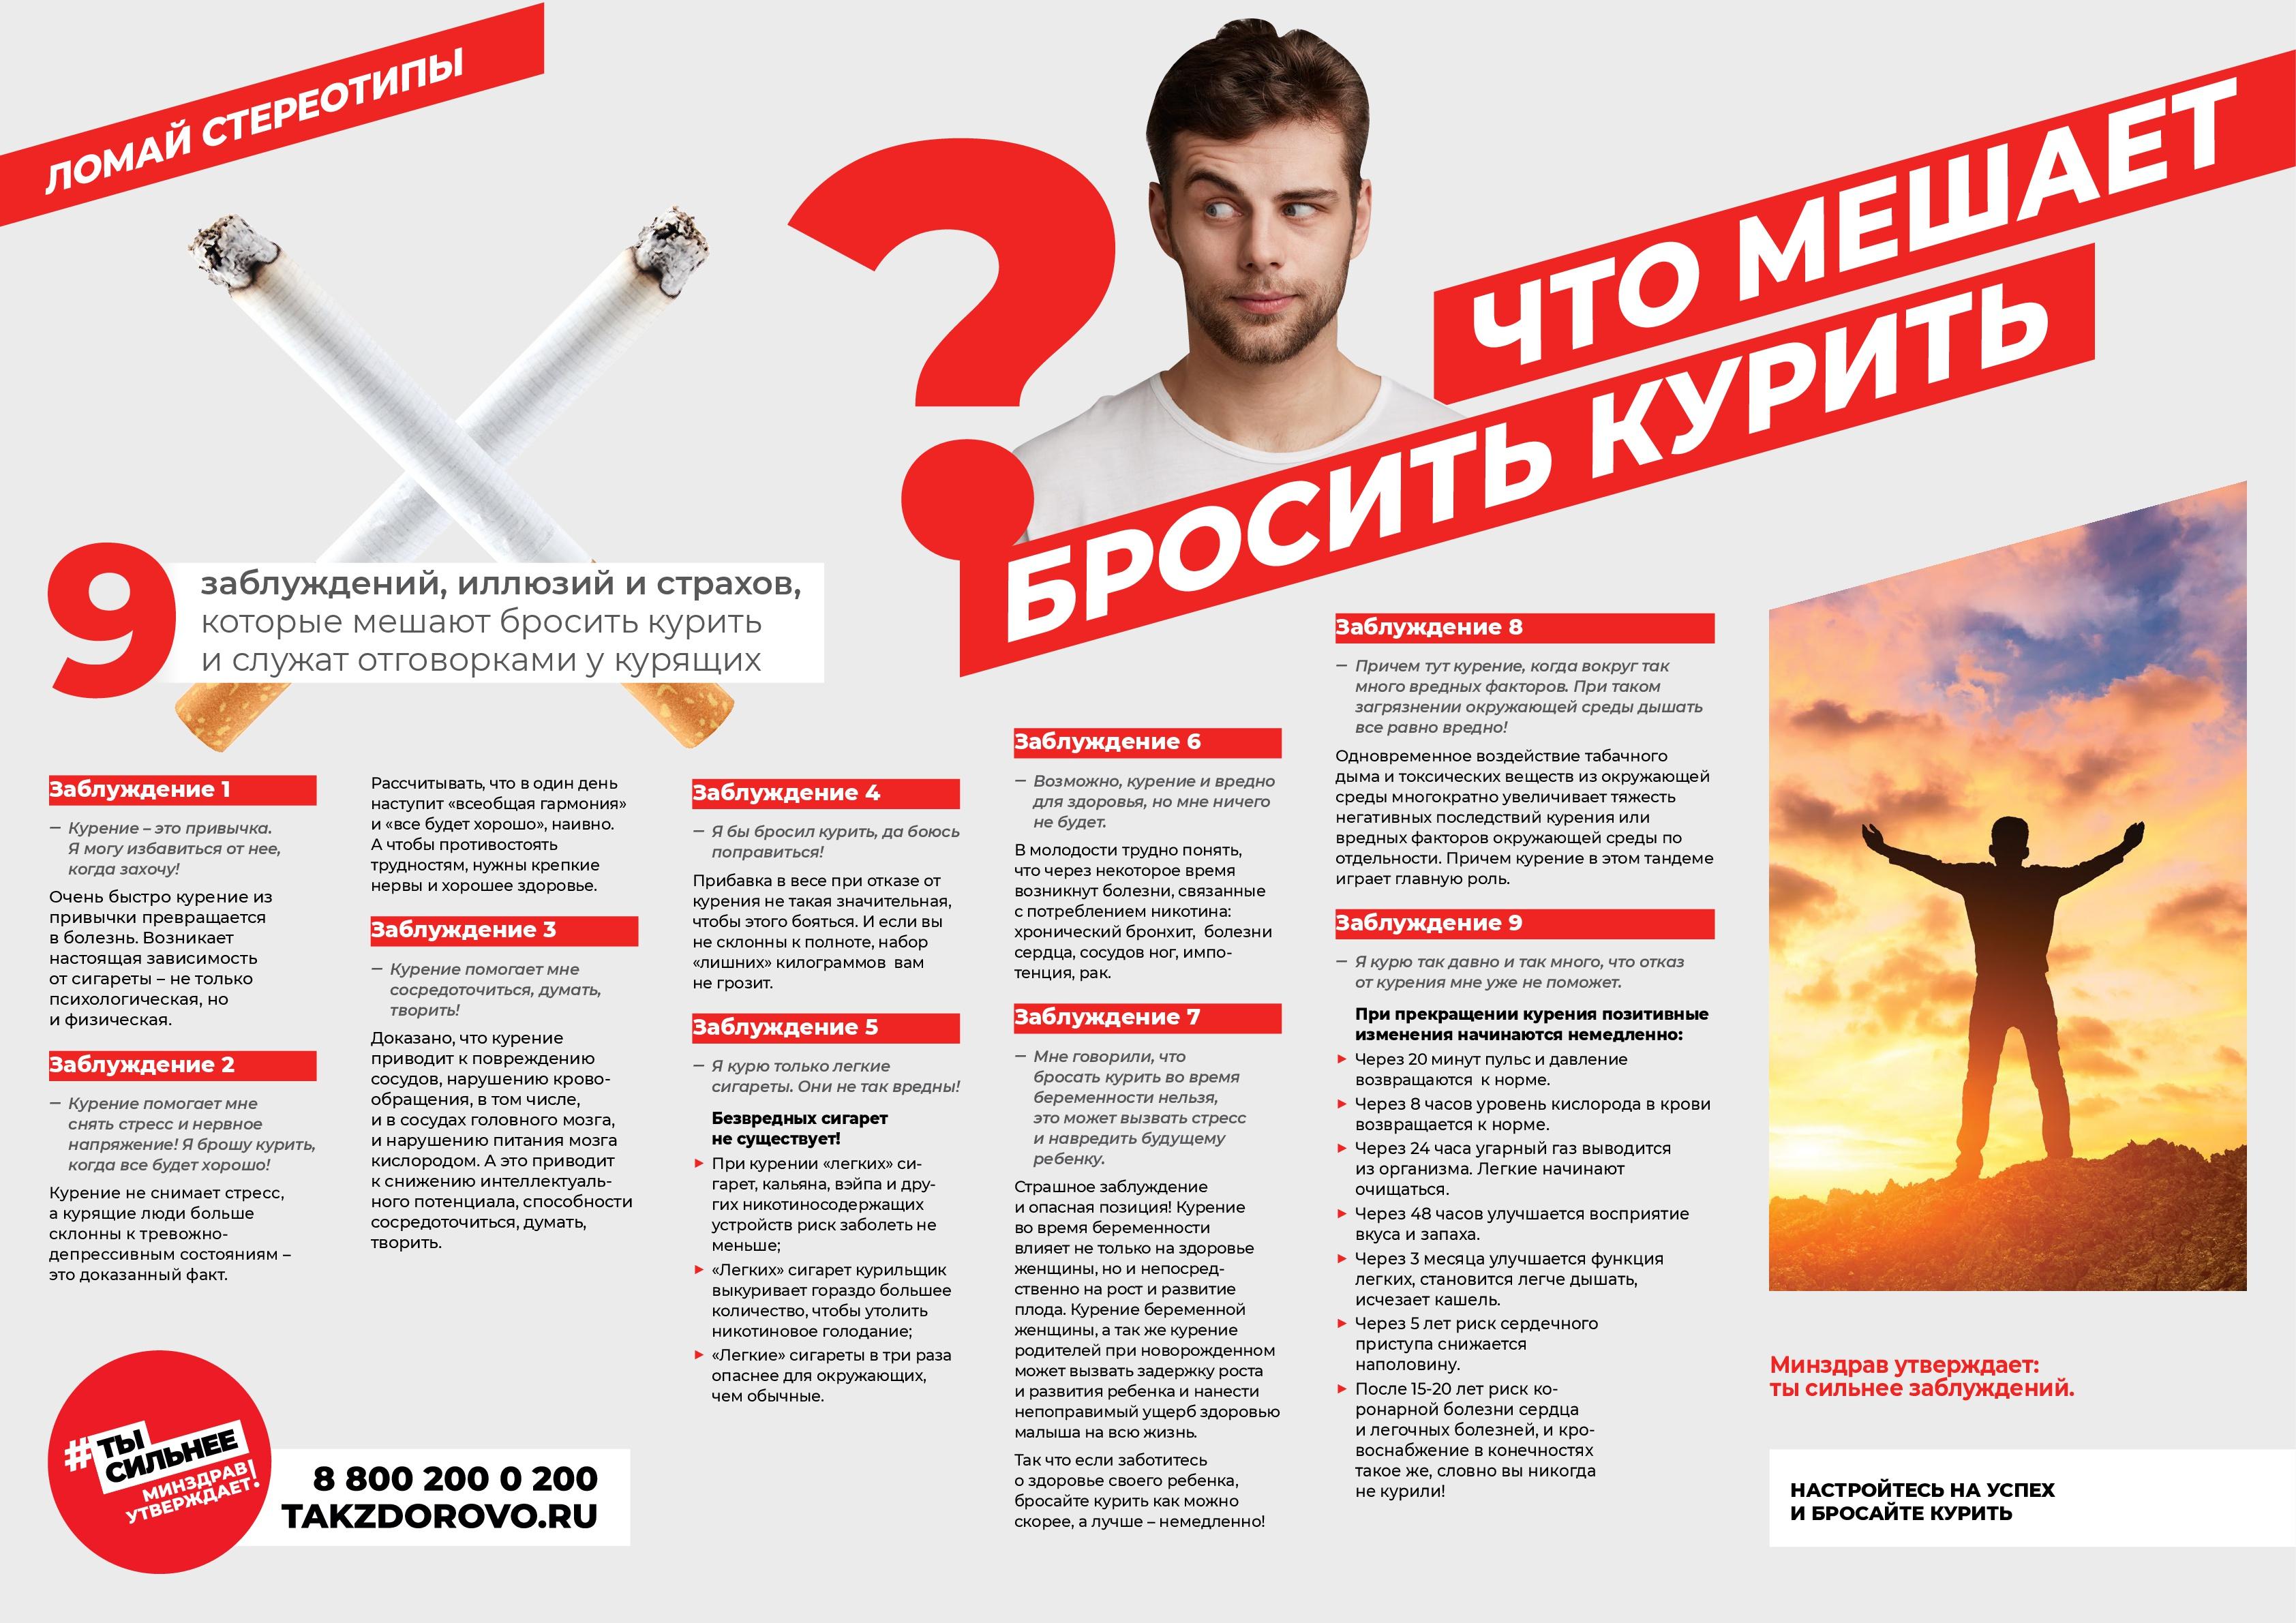 Minzdrav_poster_alko-001